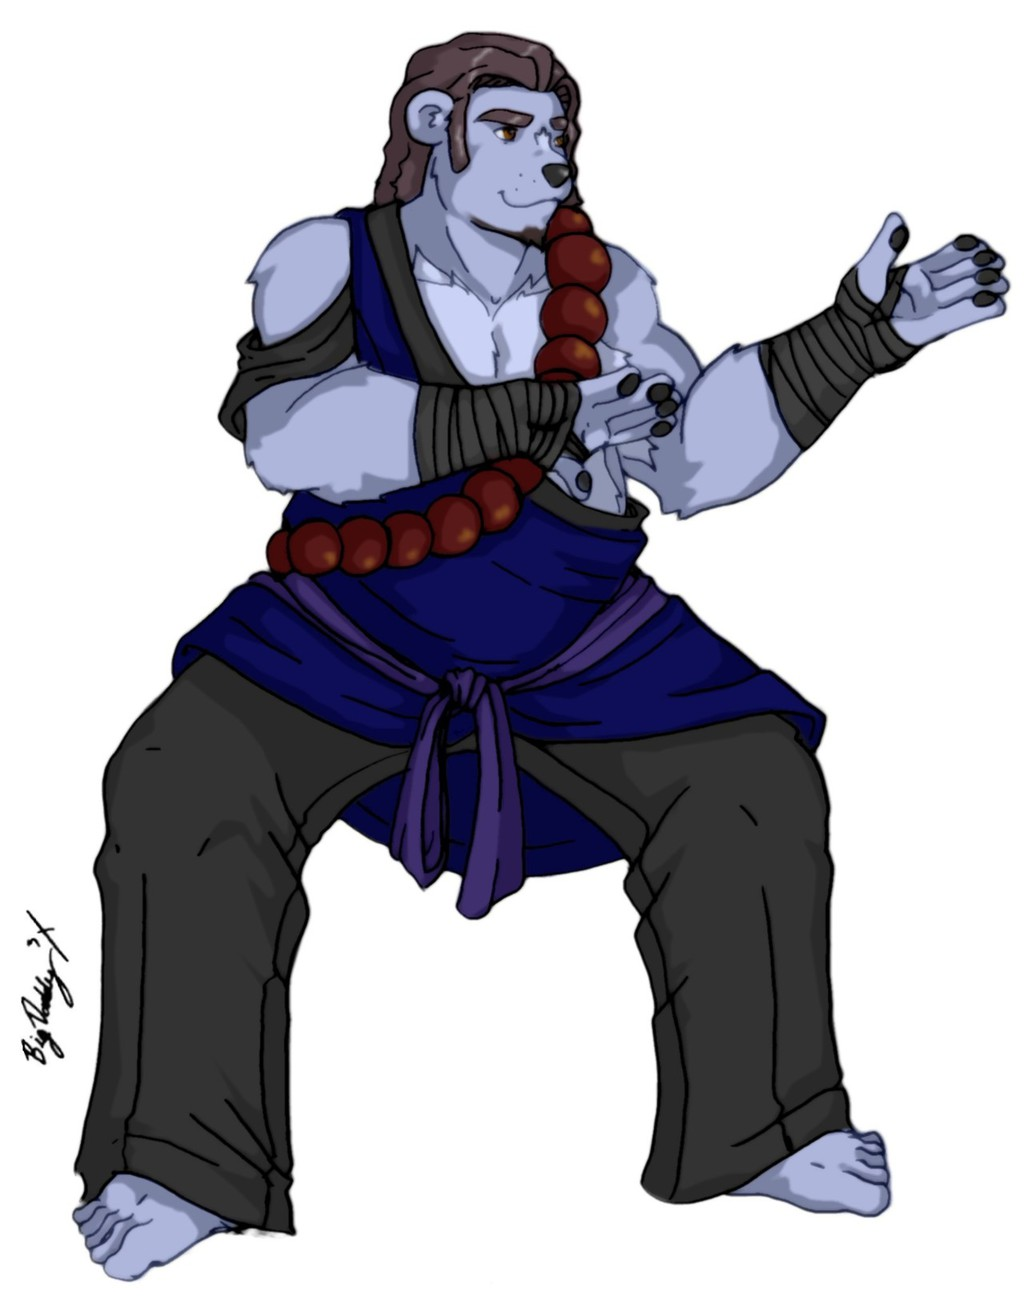 Most recent image: Tenshi Kung Fu Master